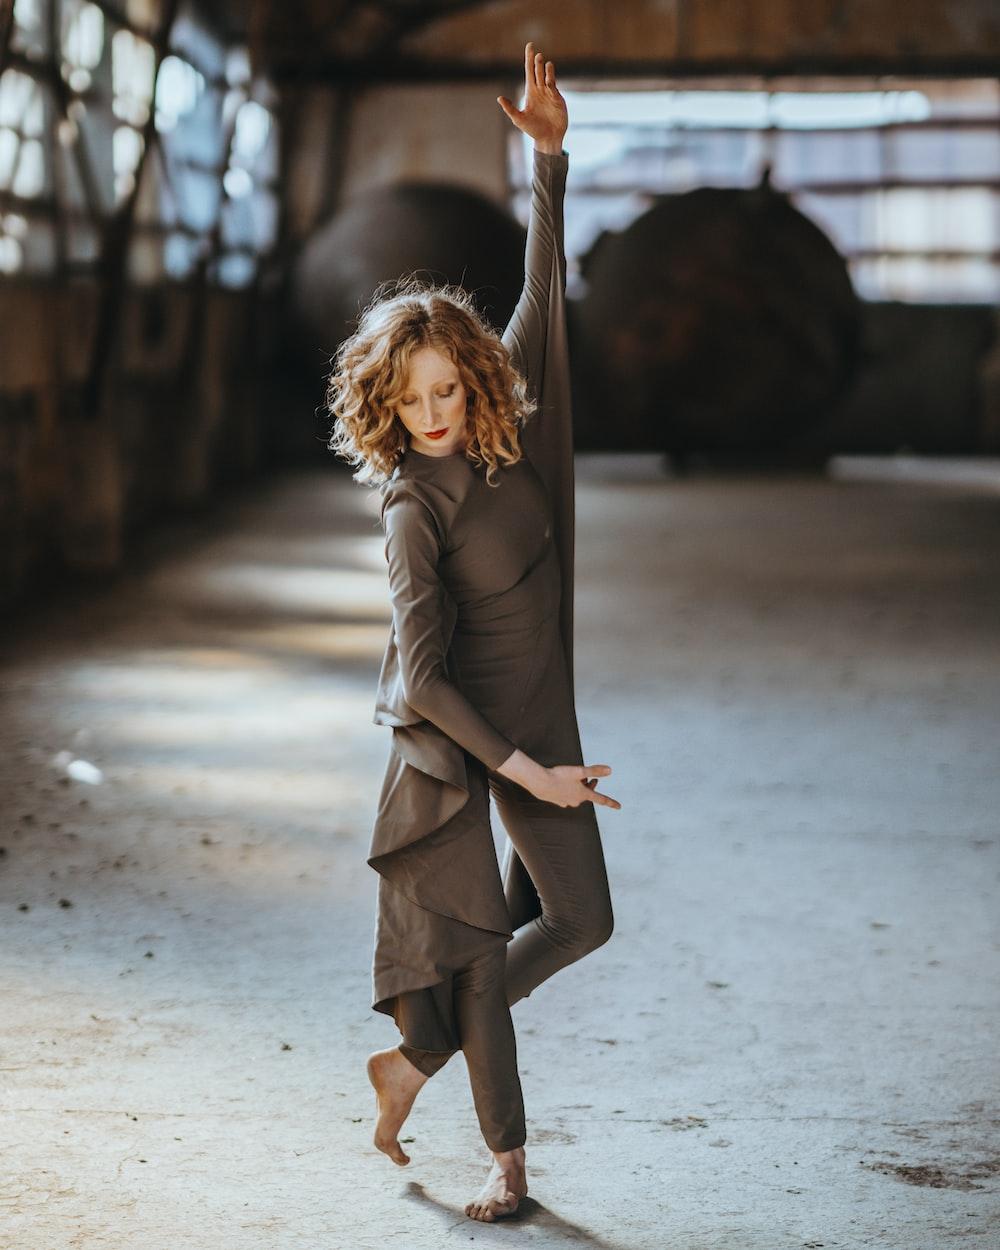 dancing woman wearing black dress